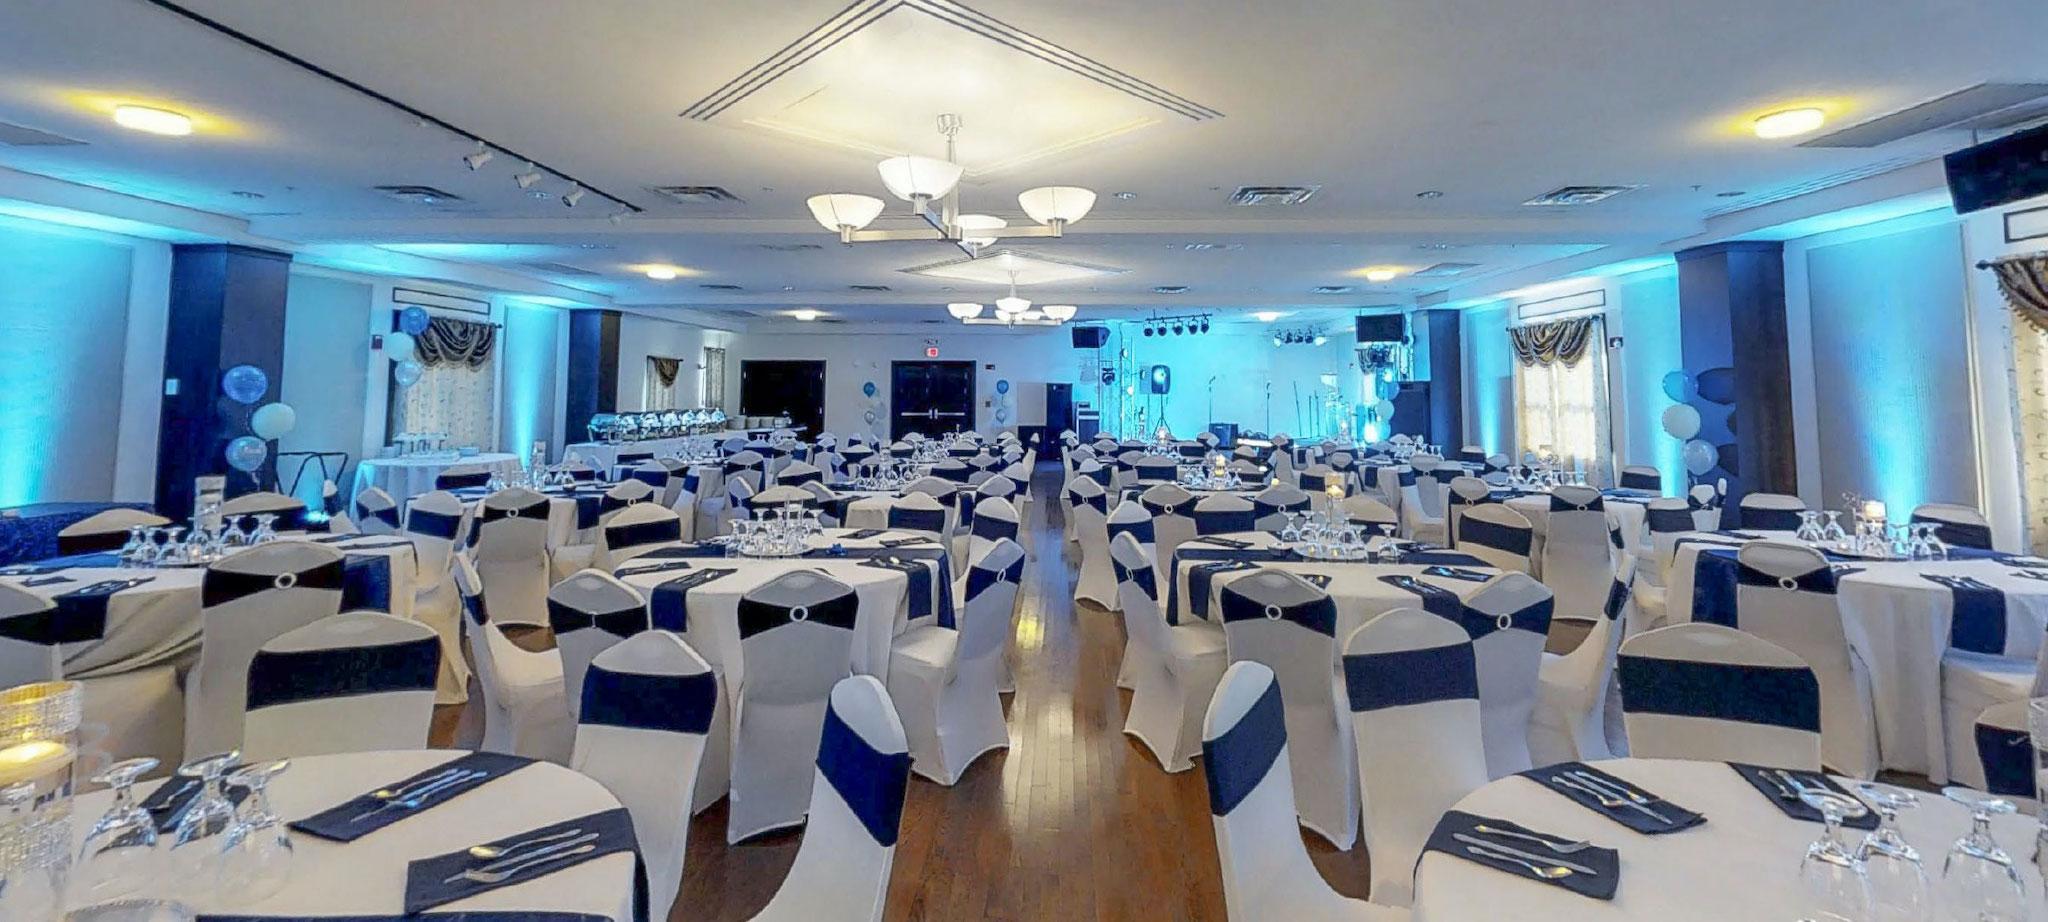 The Jordan Ballroom